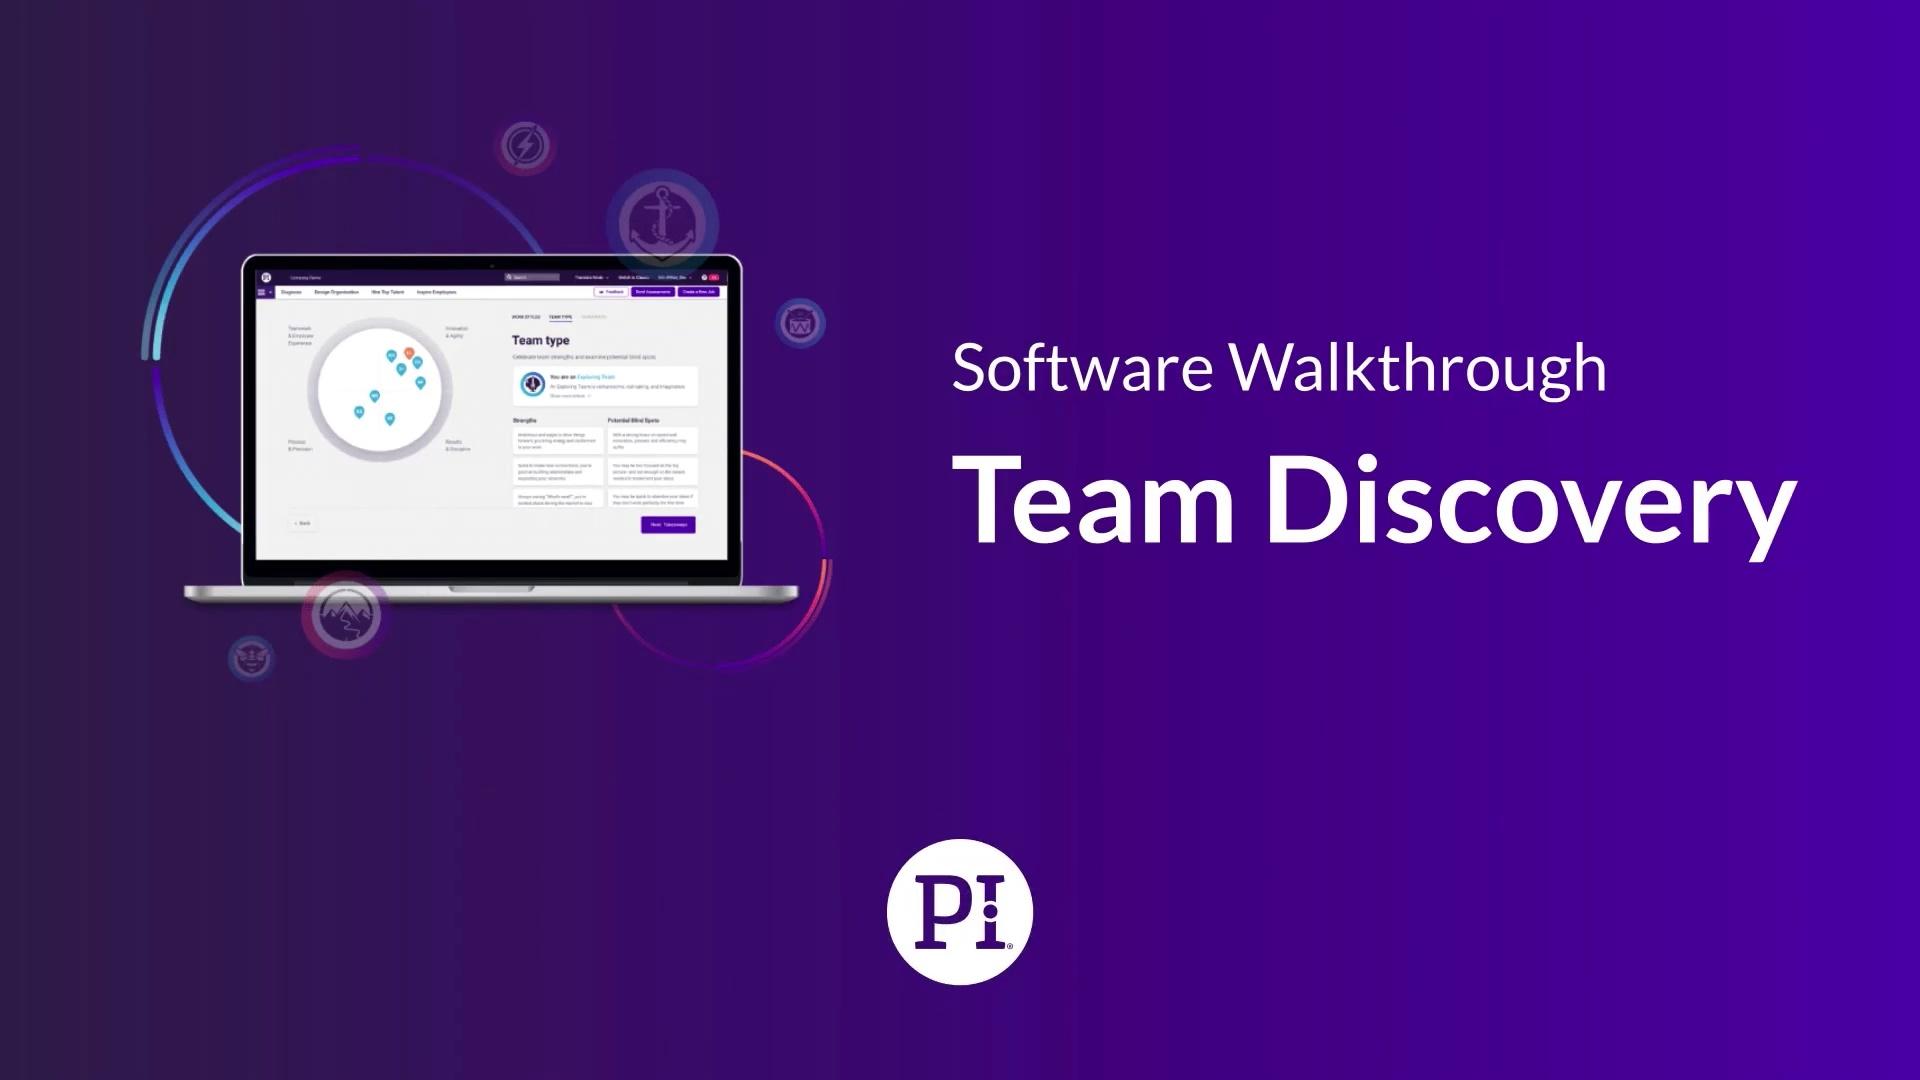 Team Discovery Software Walkthrough